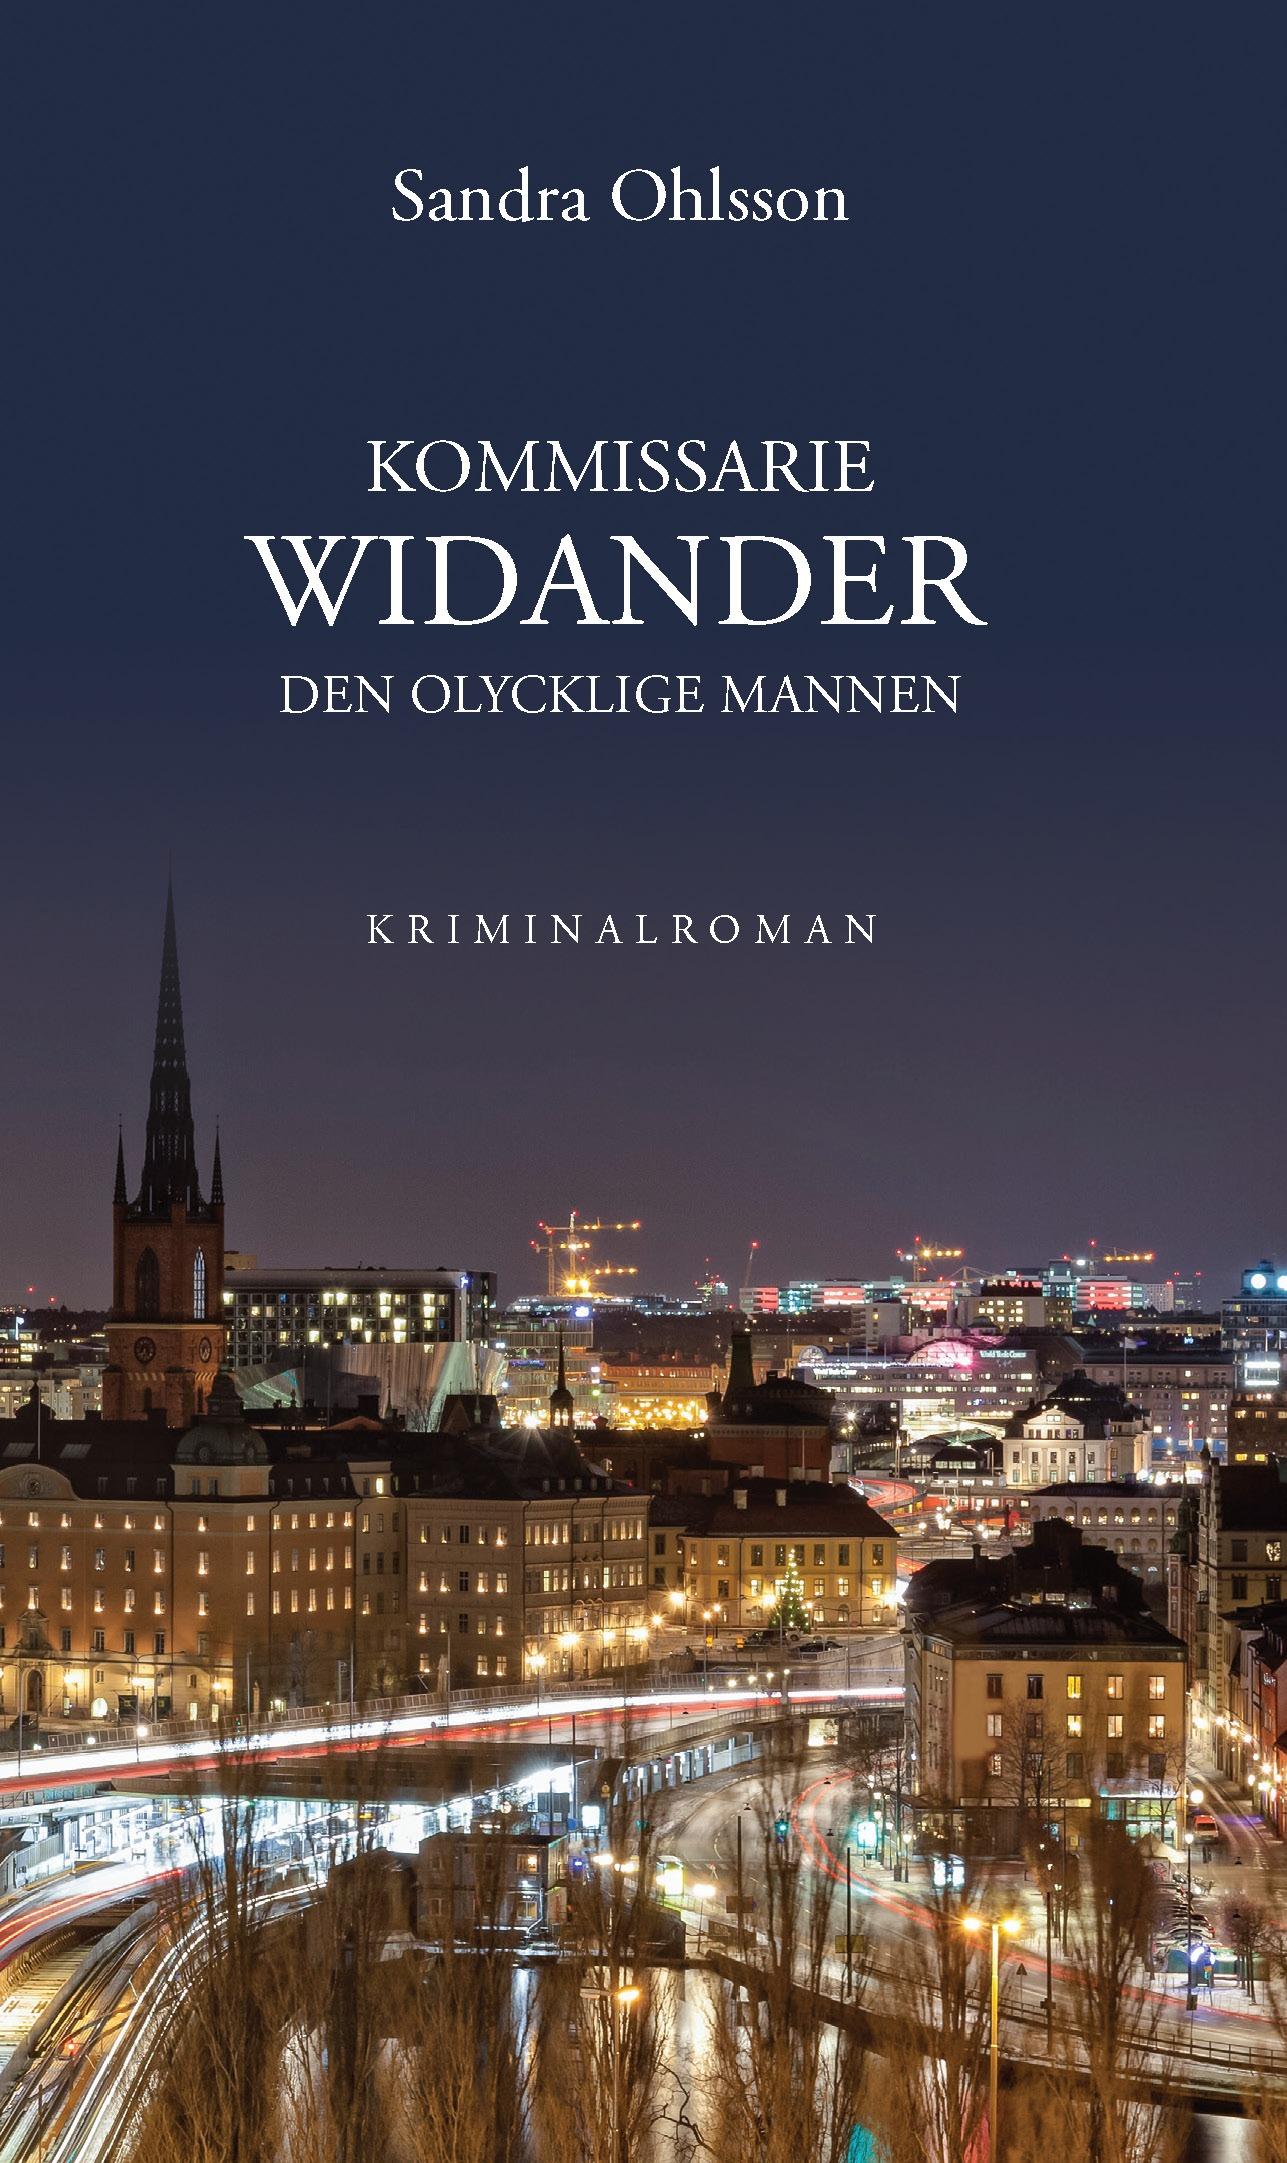 Kommissarie Widander den olycklige mannen av Sandra Ohlsson